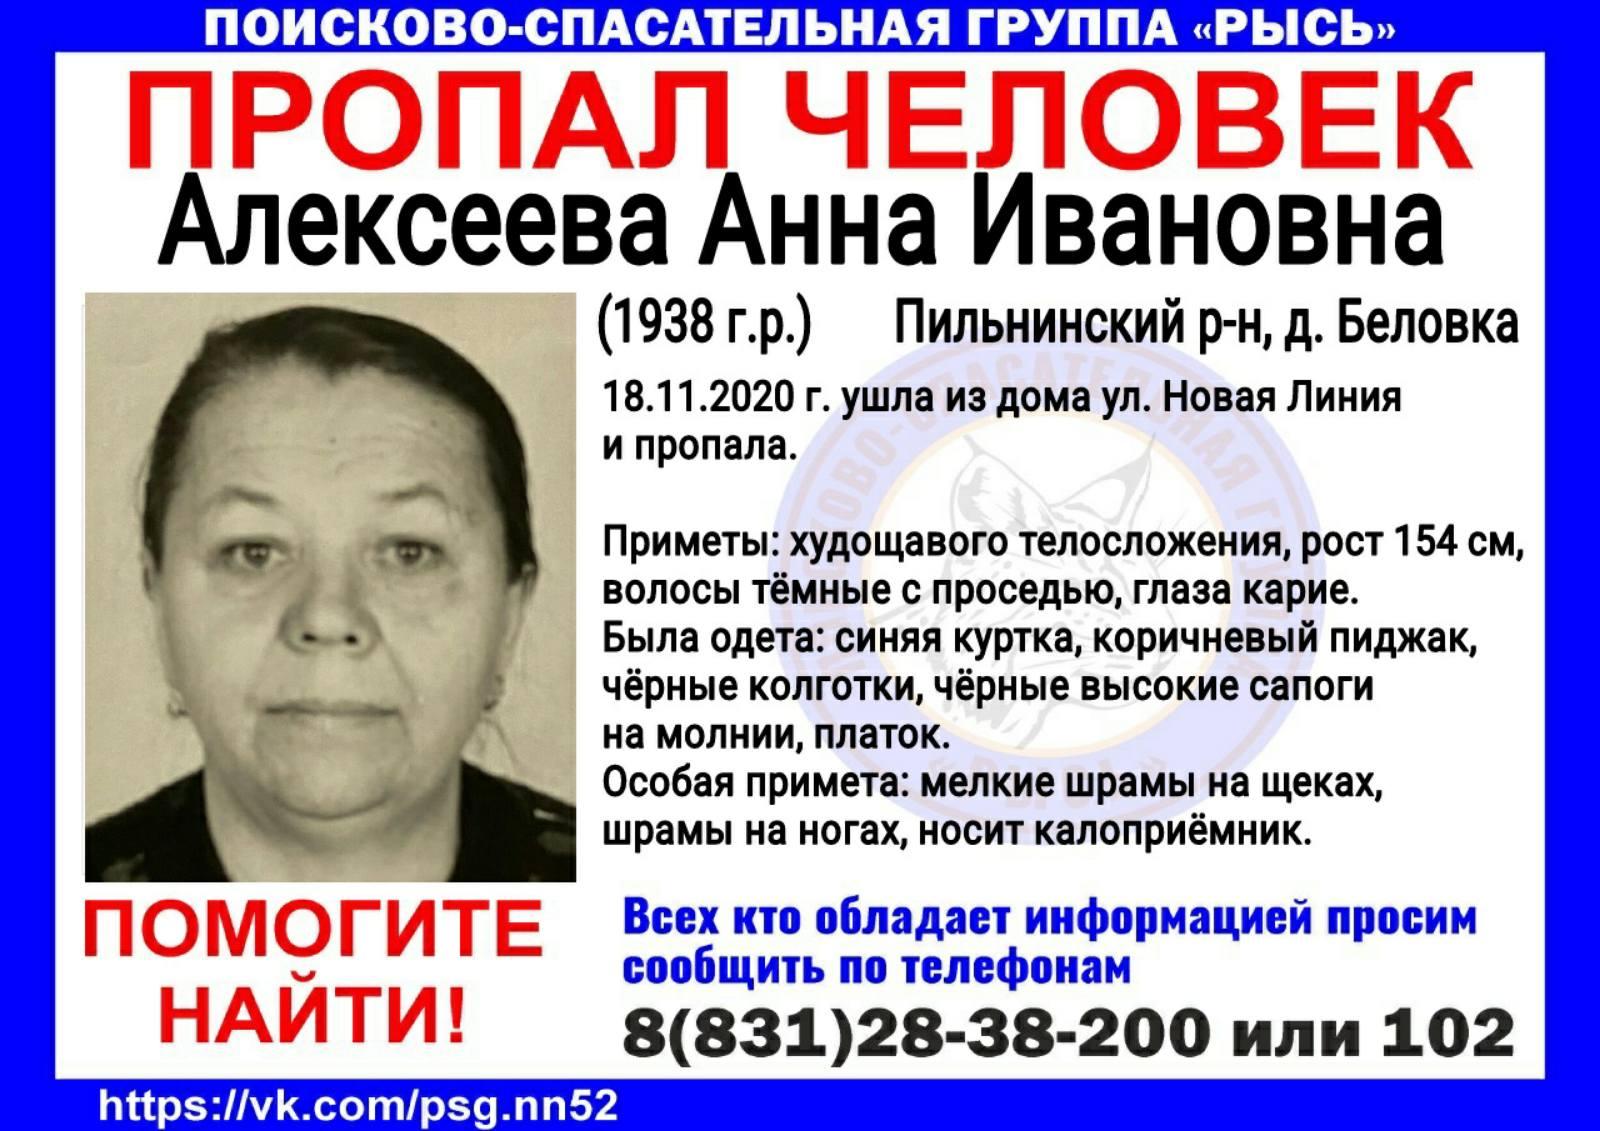 Алексеева Анна Ивановна